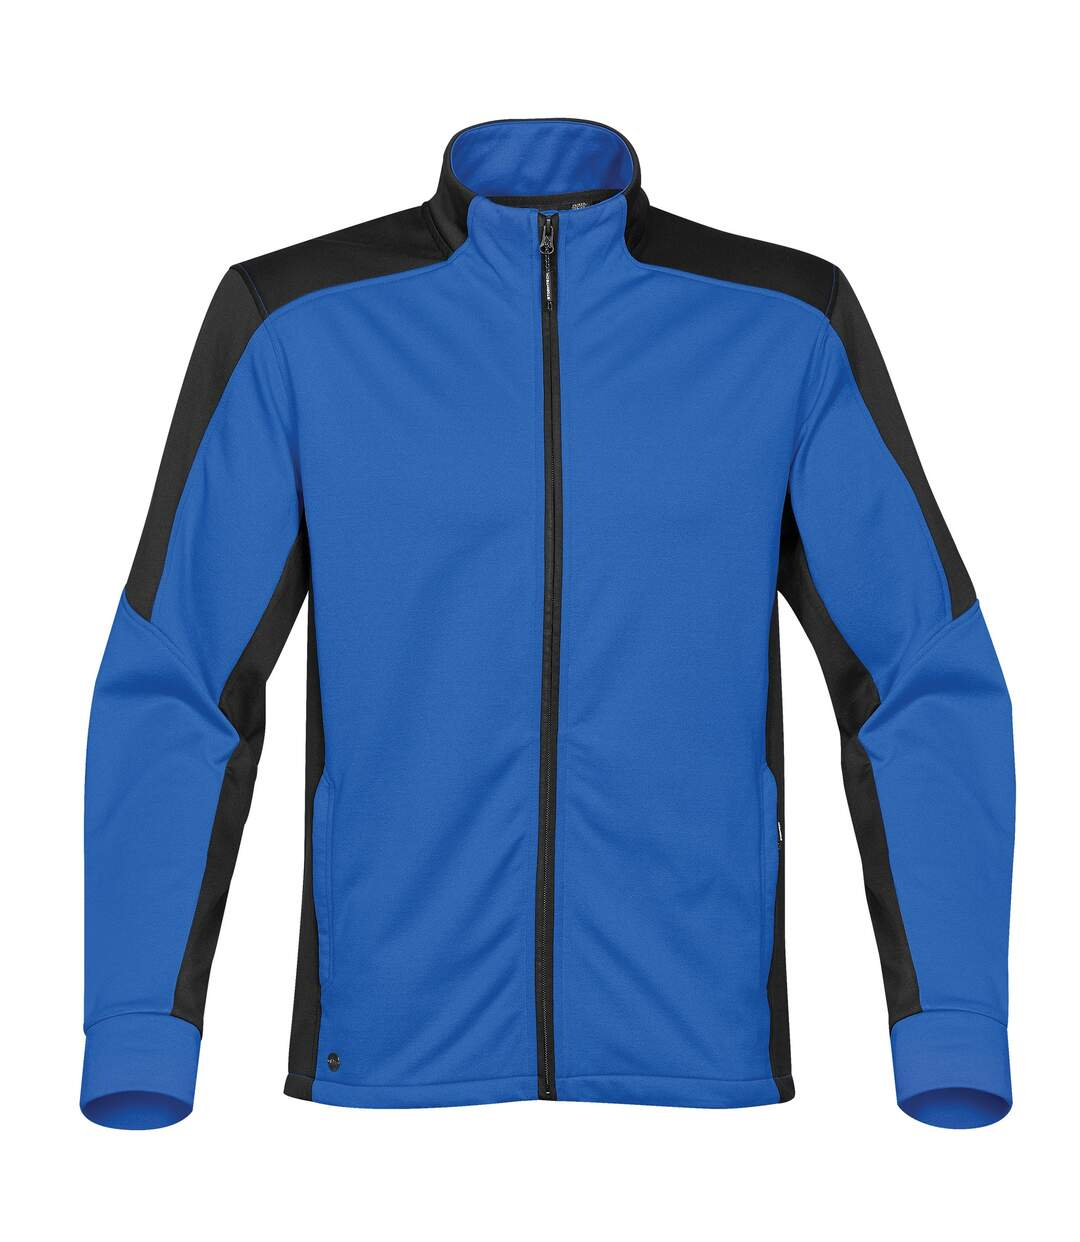 Stormtech Mens Chakra Fleece Jacket (Azure Blue) - UTRW5982